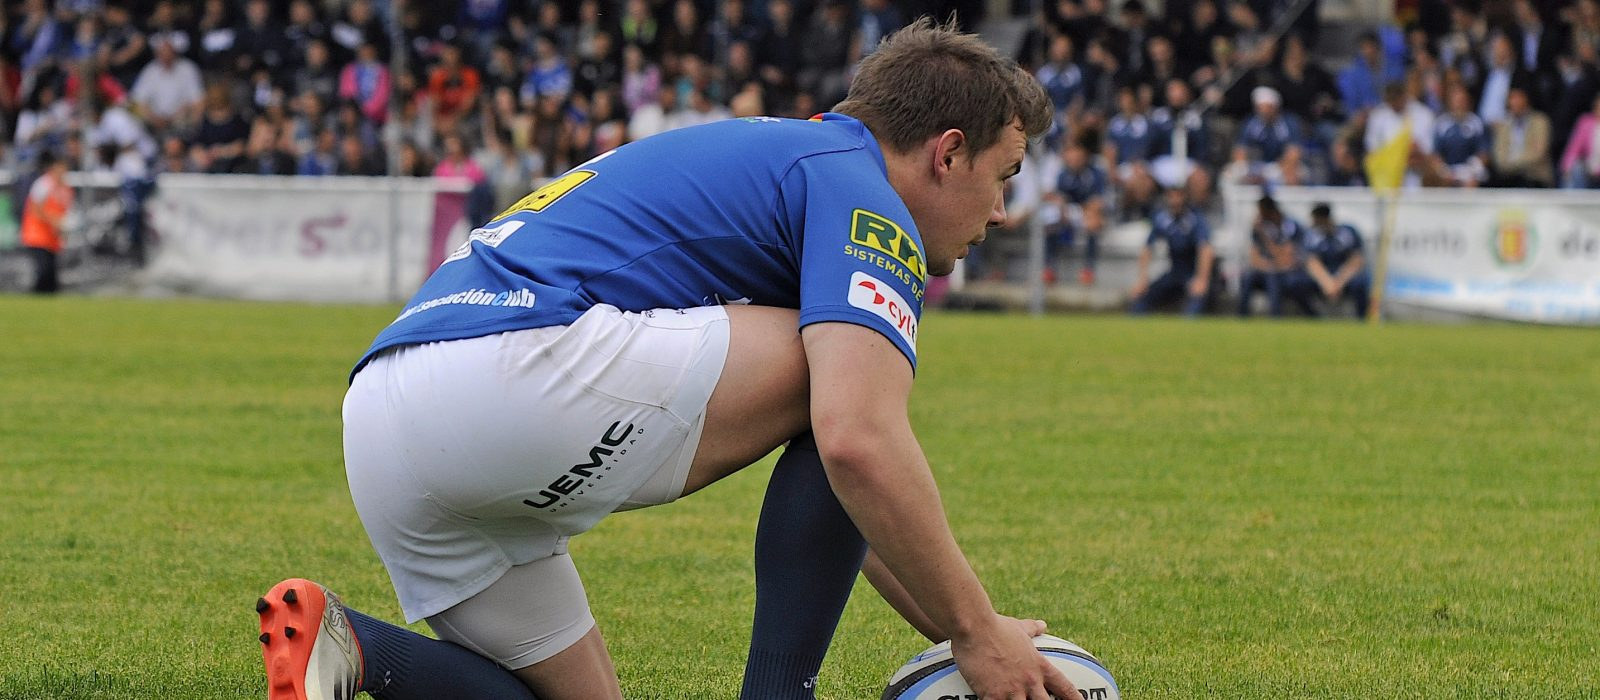 Gareth Griffiths dice adiós